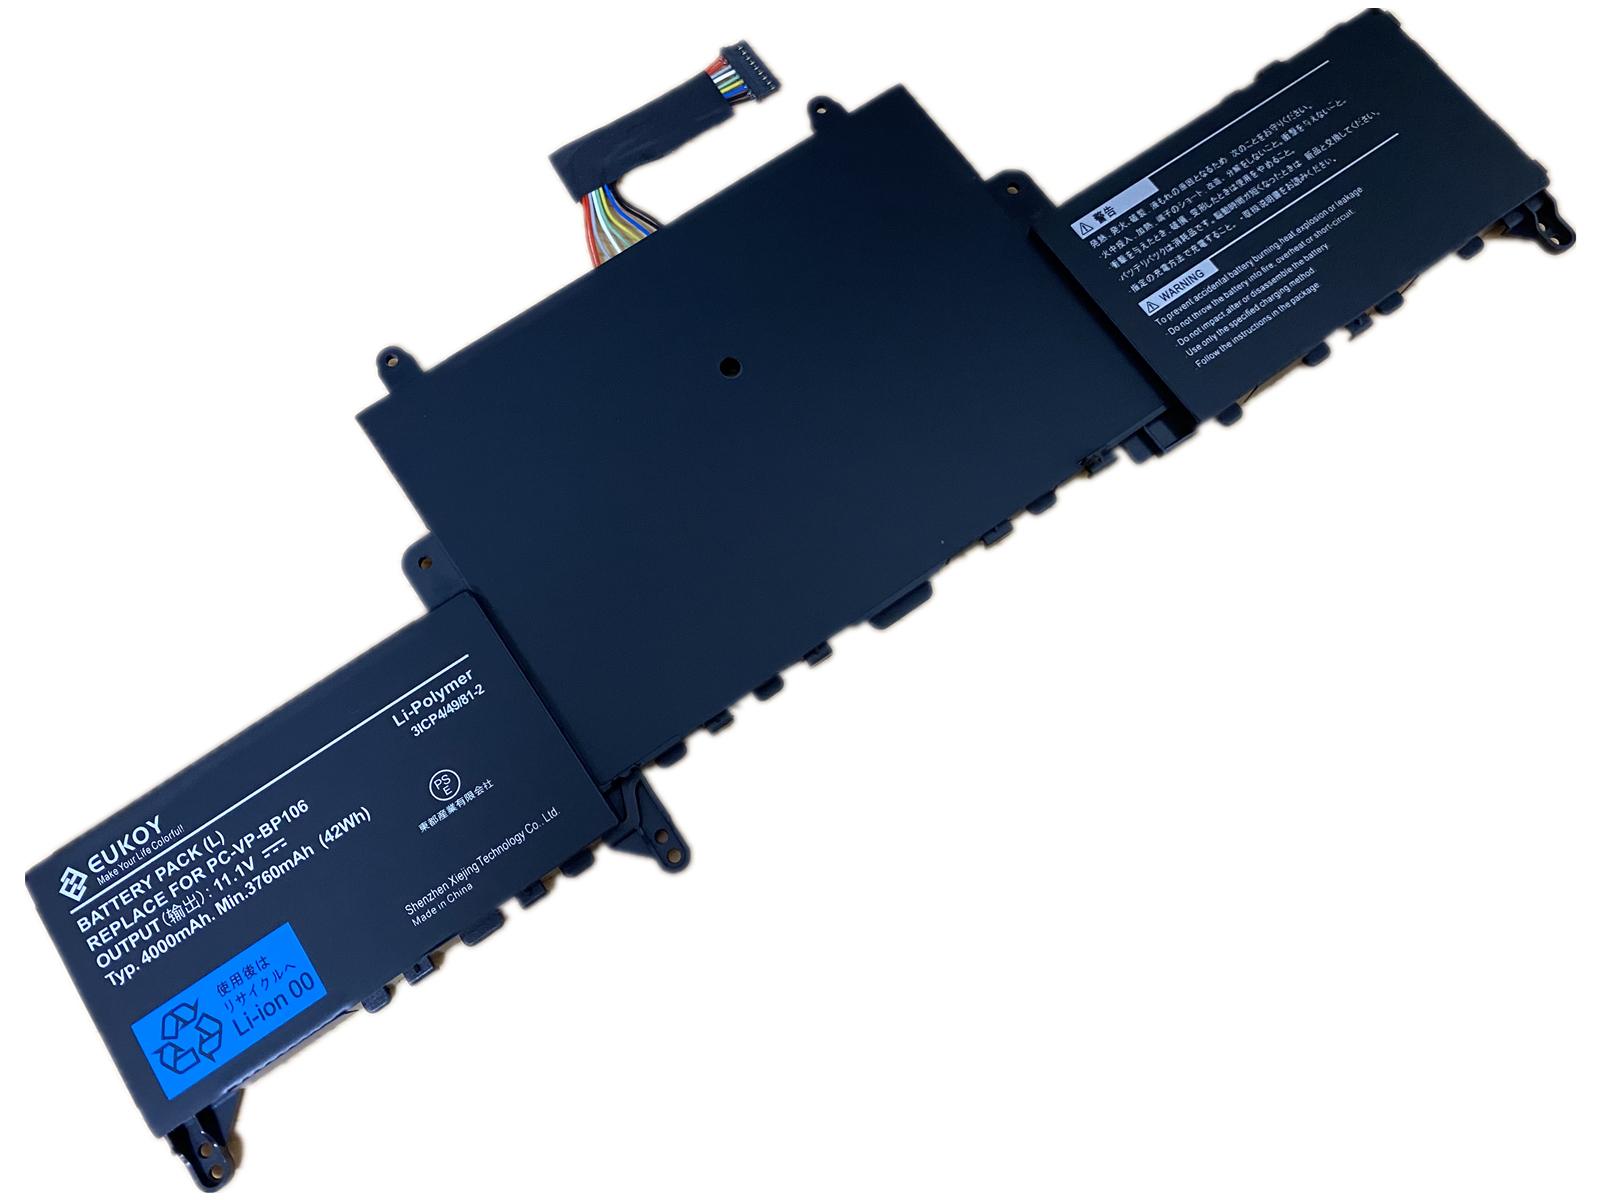 NEC LAVIE Hybrid ZERO 通販 PC-HZ550用リチウムポリマーバッテリー オーバーのアイテム取扱☆ 大容量 PC-VP-BP106互換品 1年保証 PSE認証済製品